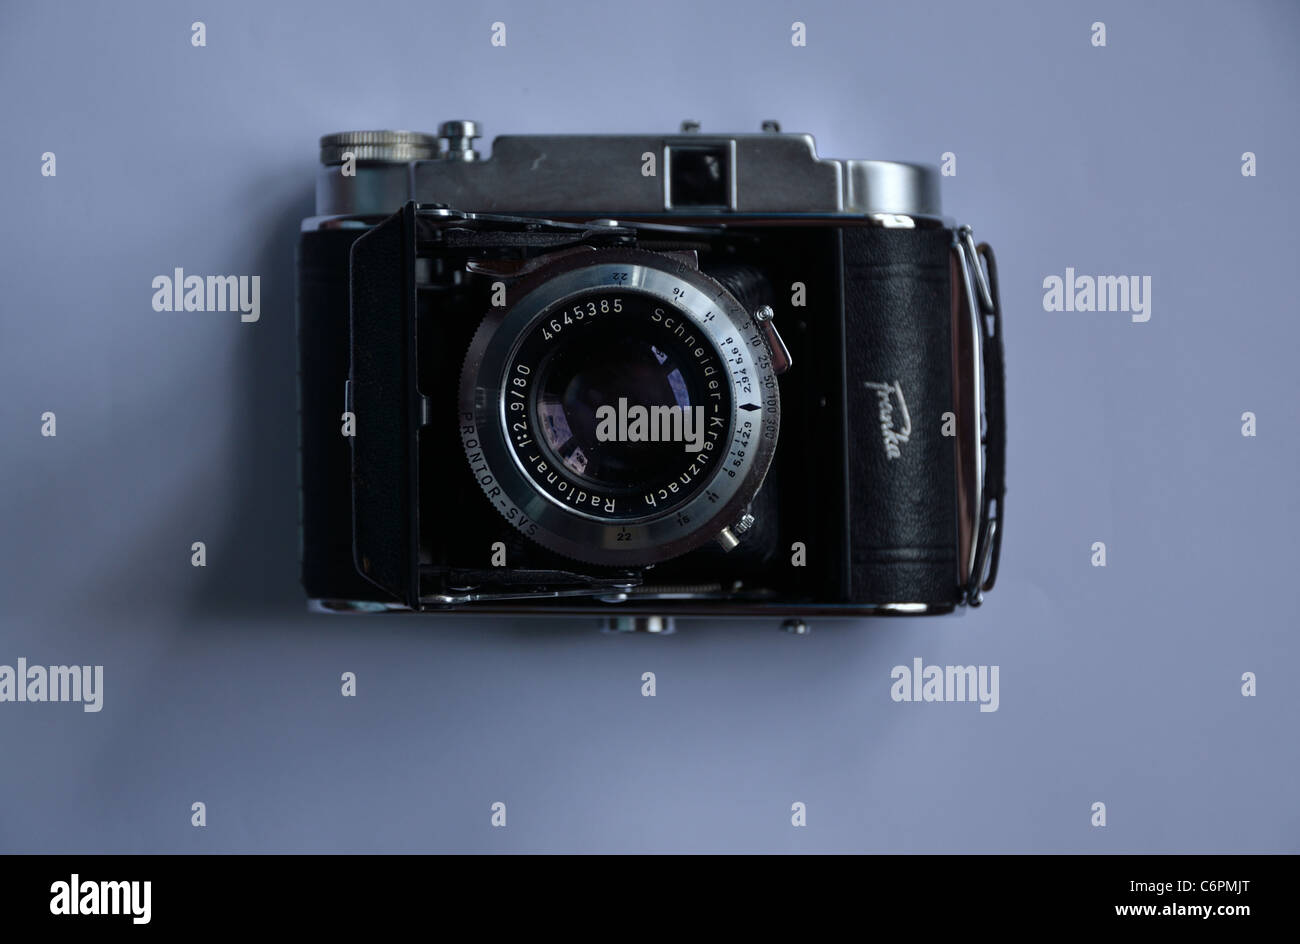 Vintage camera - Stock Image